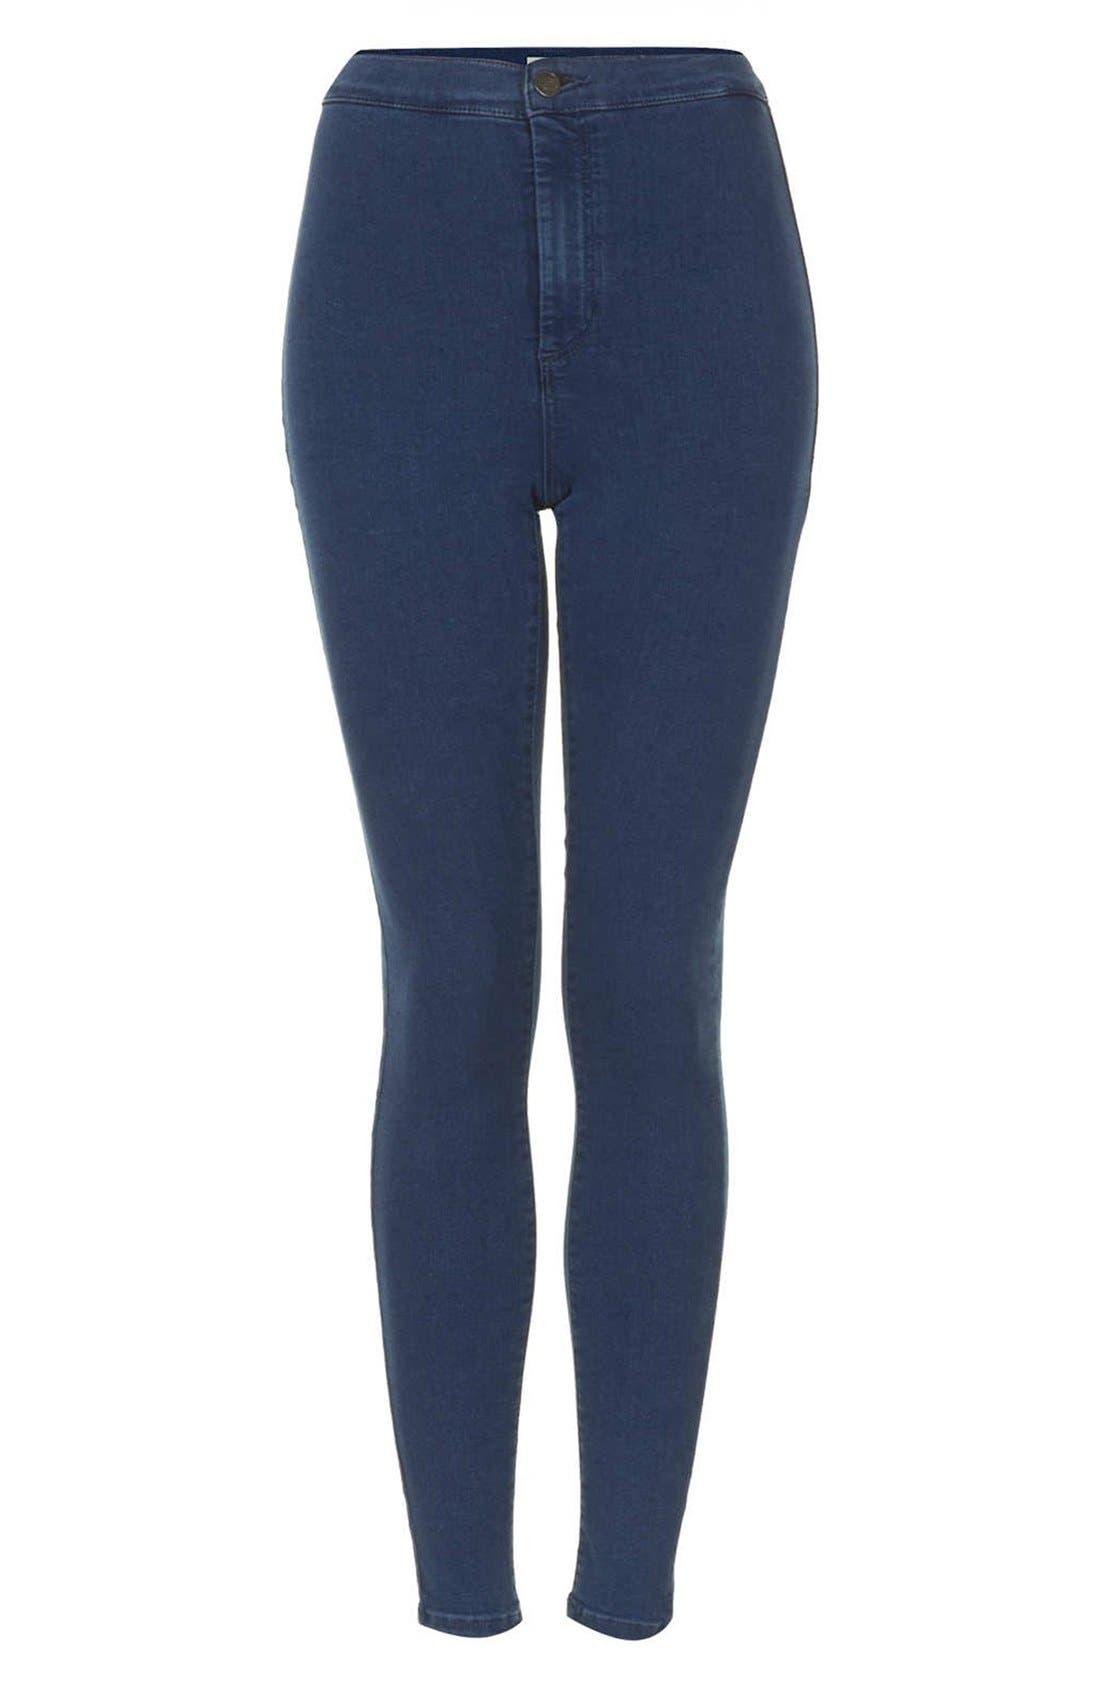 Alternate Image 3  - Topshop Moto 'Joni' High Rise Skinny Jeans (Dark Stone) (Regular, Short & Long)